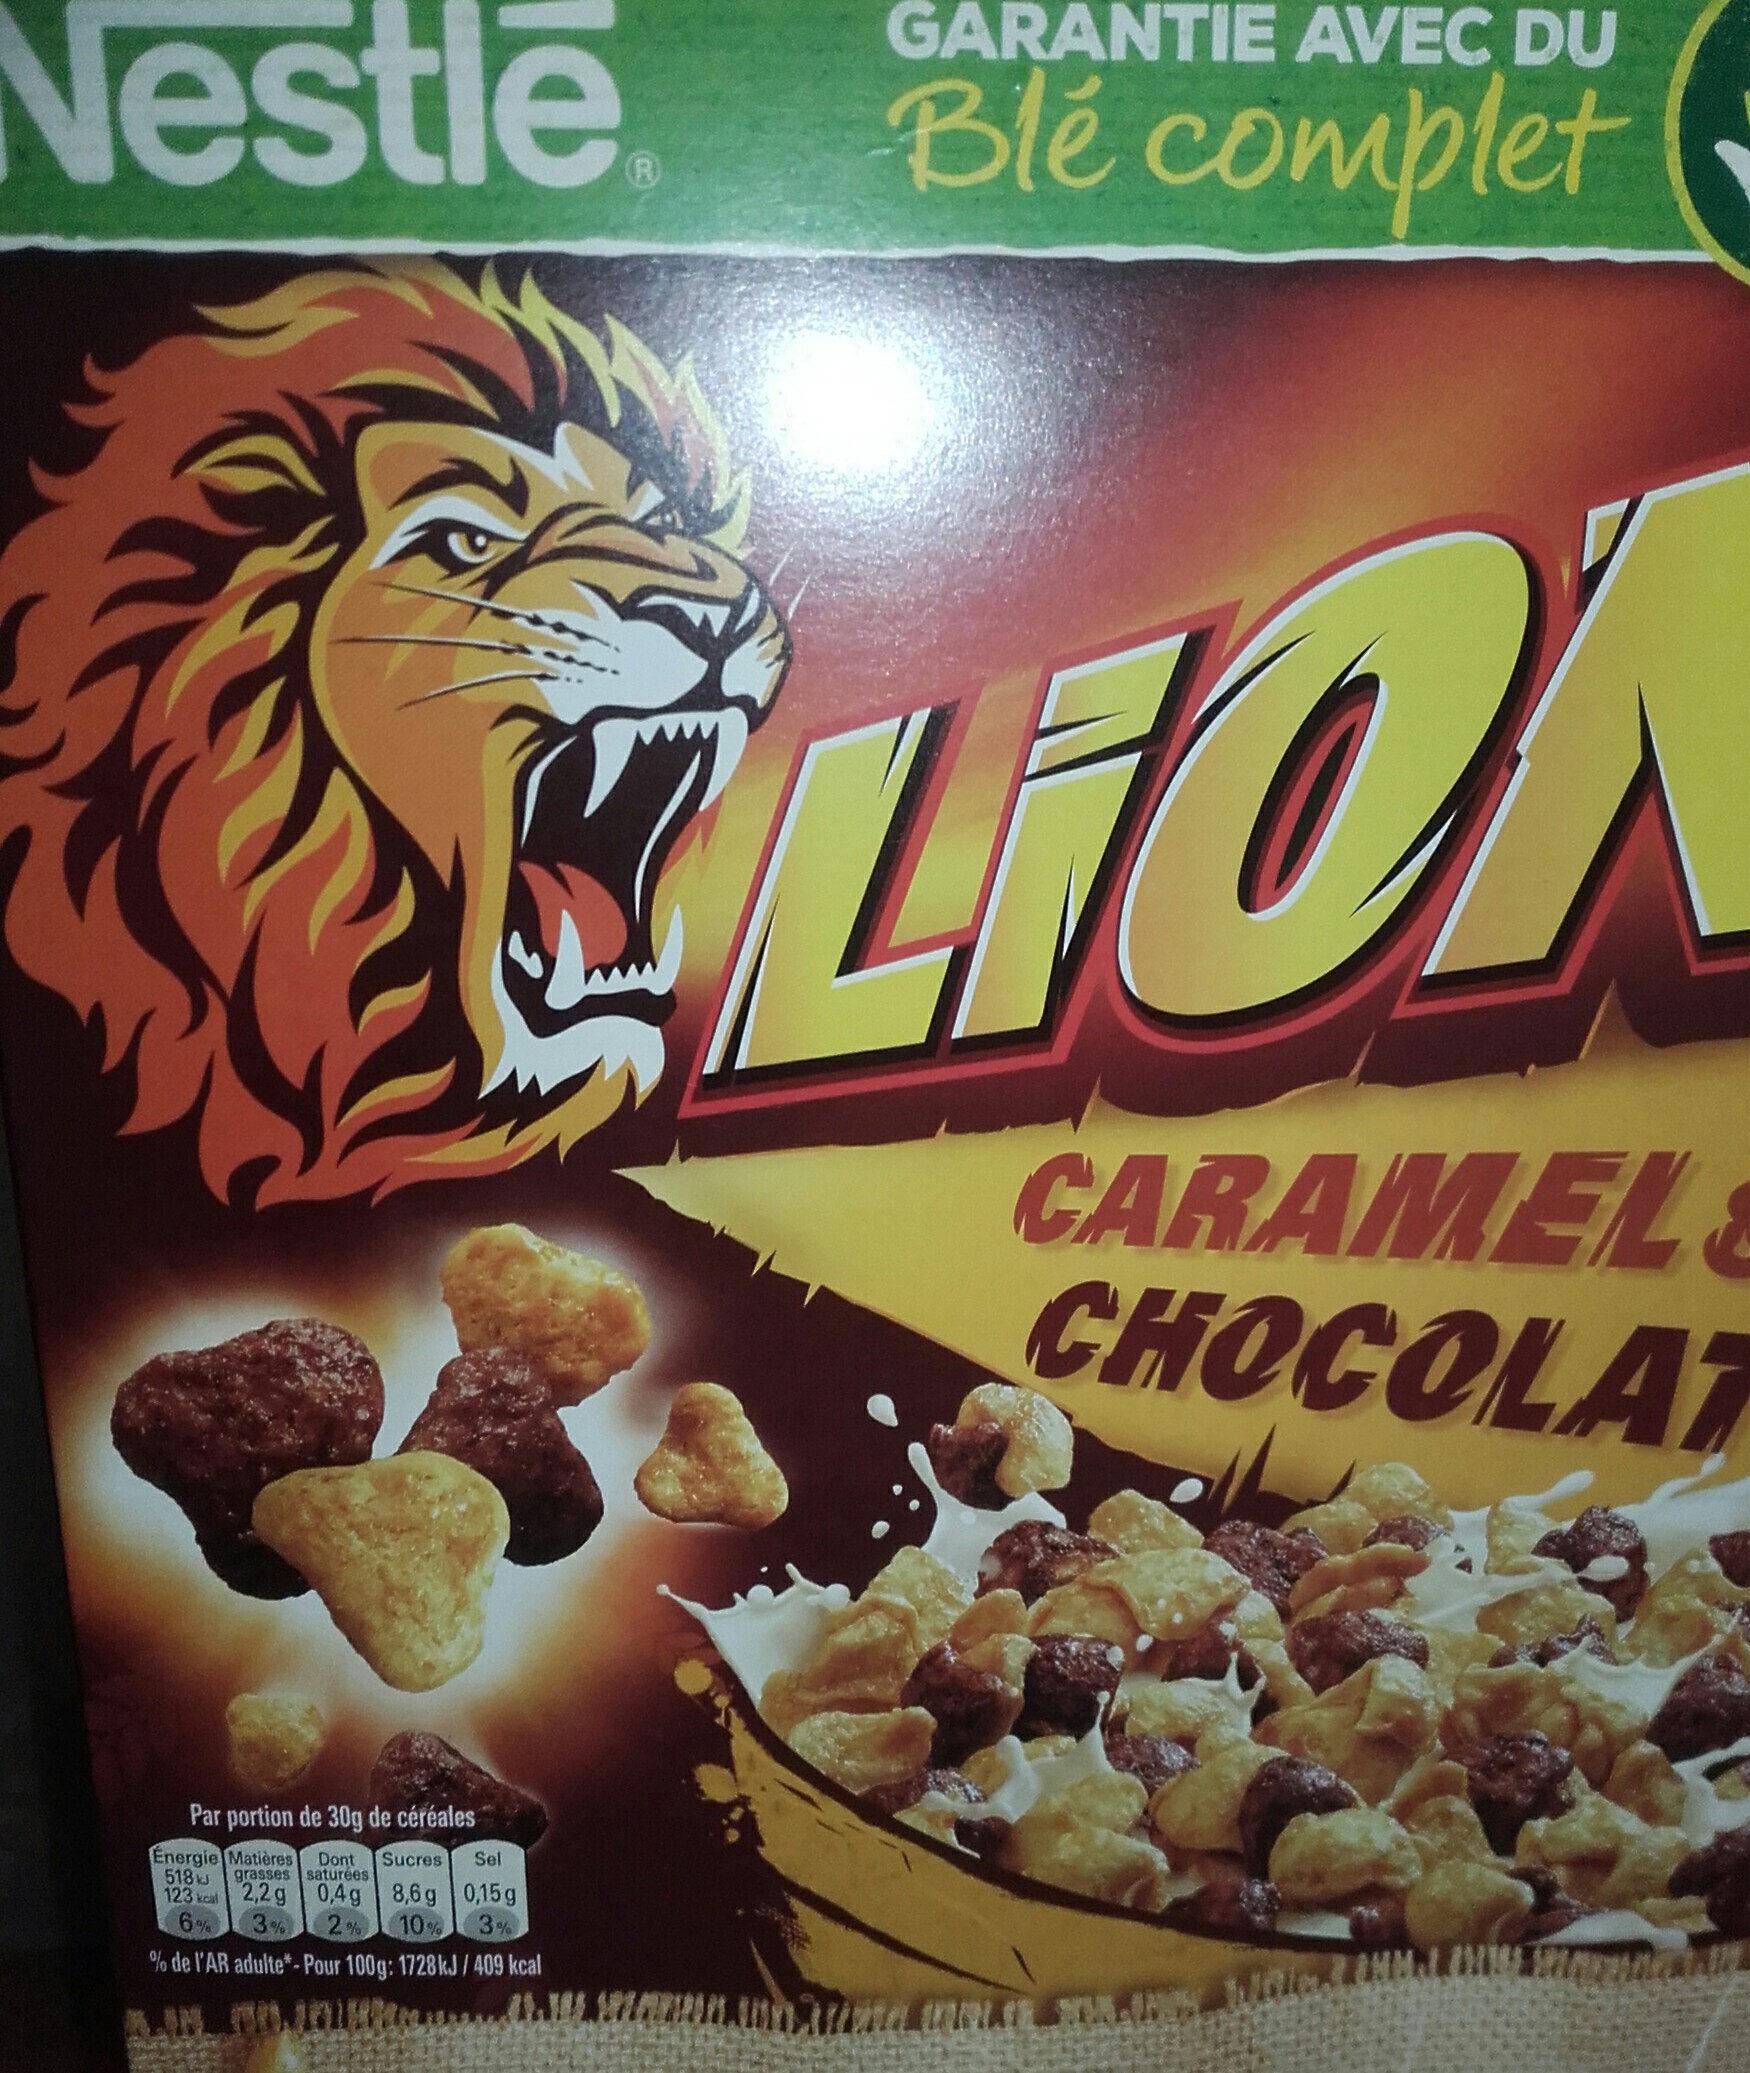 Lion caramel & chocolat - Produit - fr